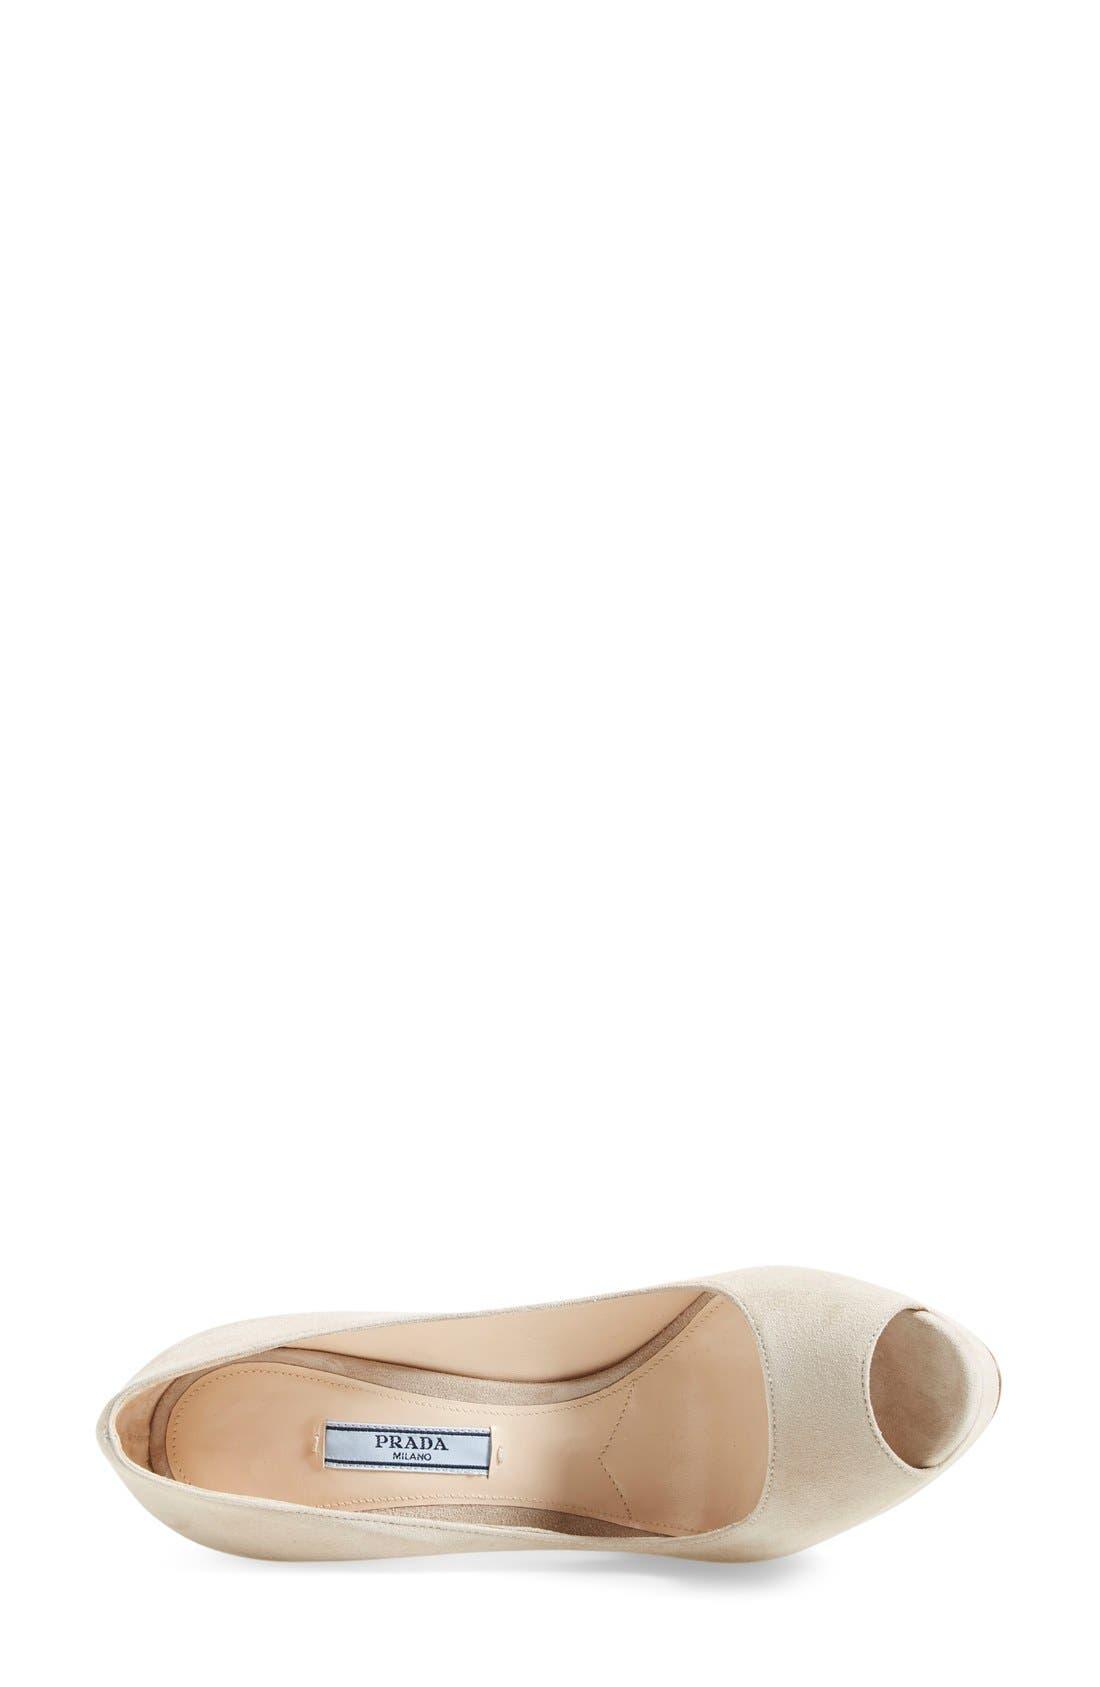 Alternate Image 3  - Prada Platform Peep Toe Pump (Women)